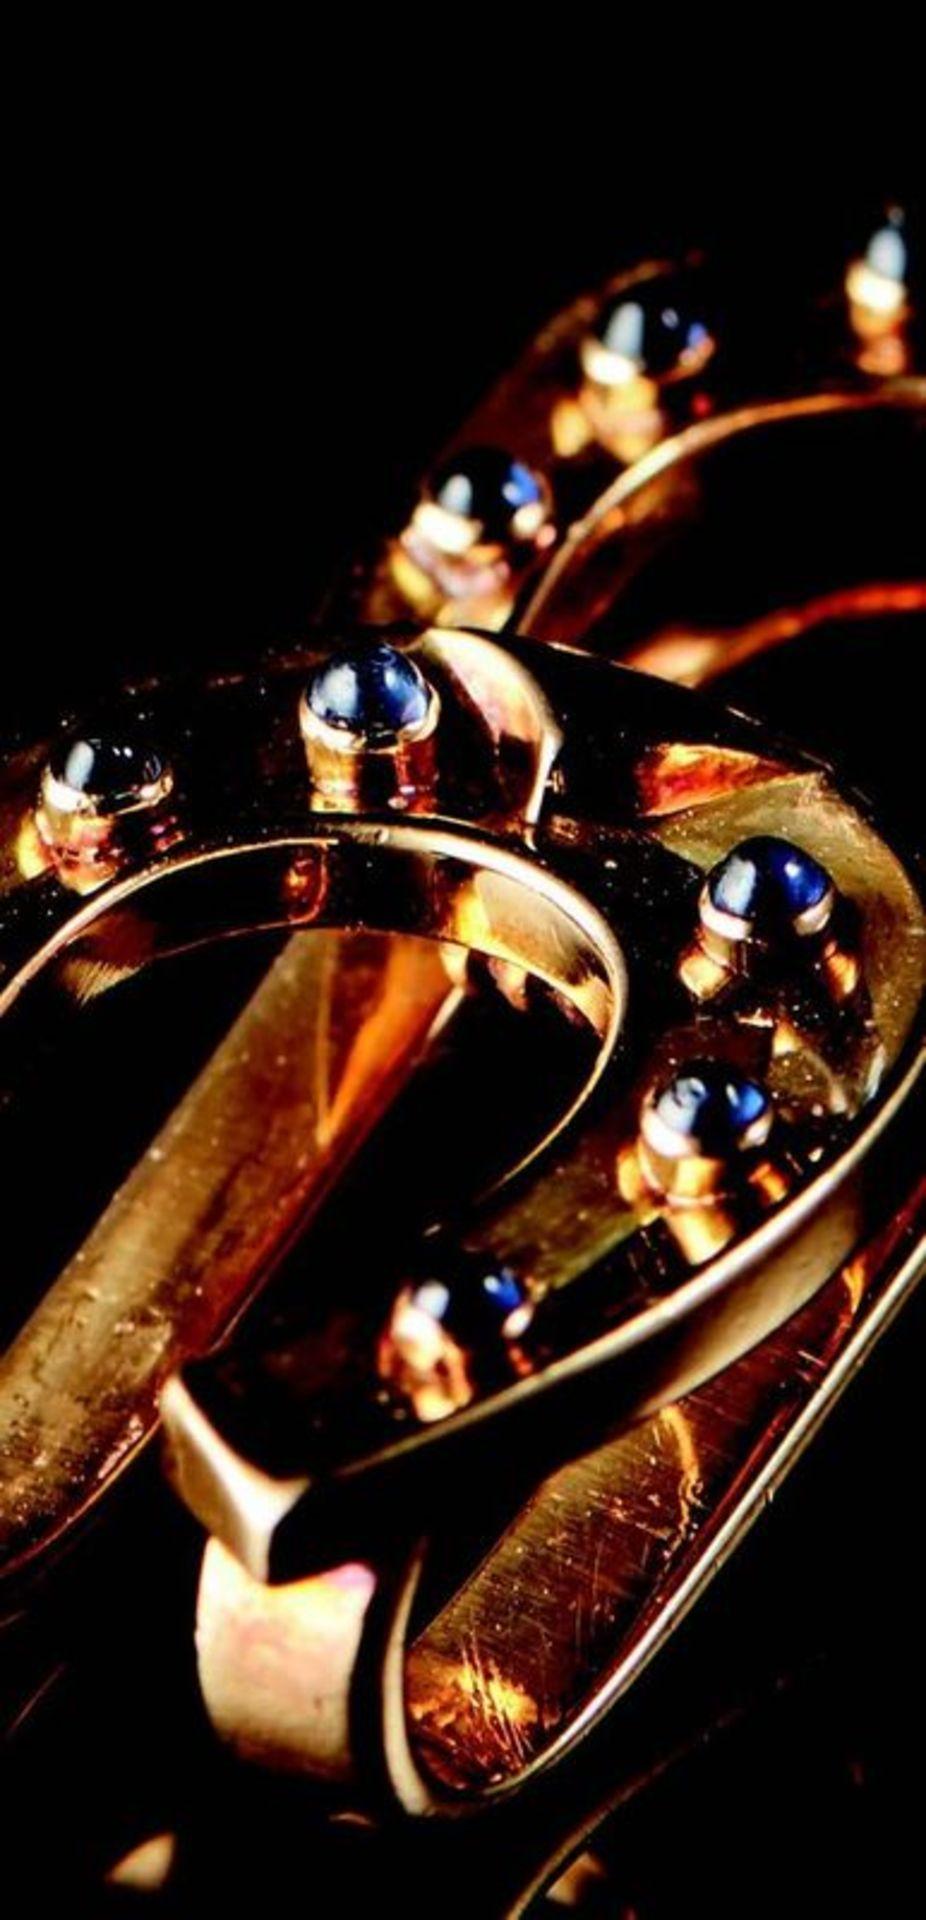 VINTAGE VAN CLEEF & ARPELS TIE PIN / MONEY CLIP WITH SAPPHIRES - 18k gold, cabochon [...]